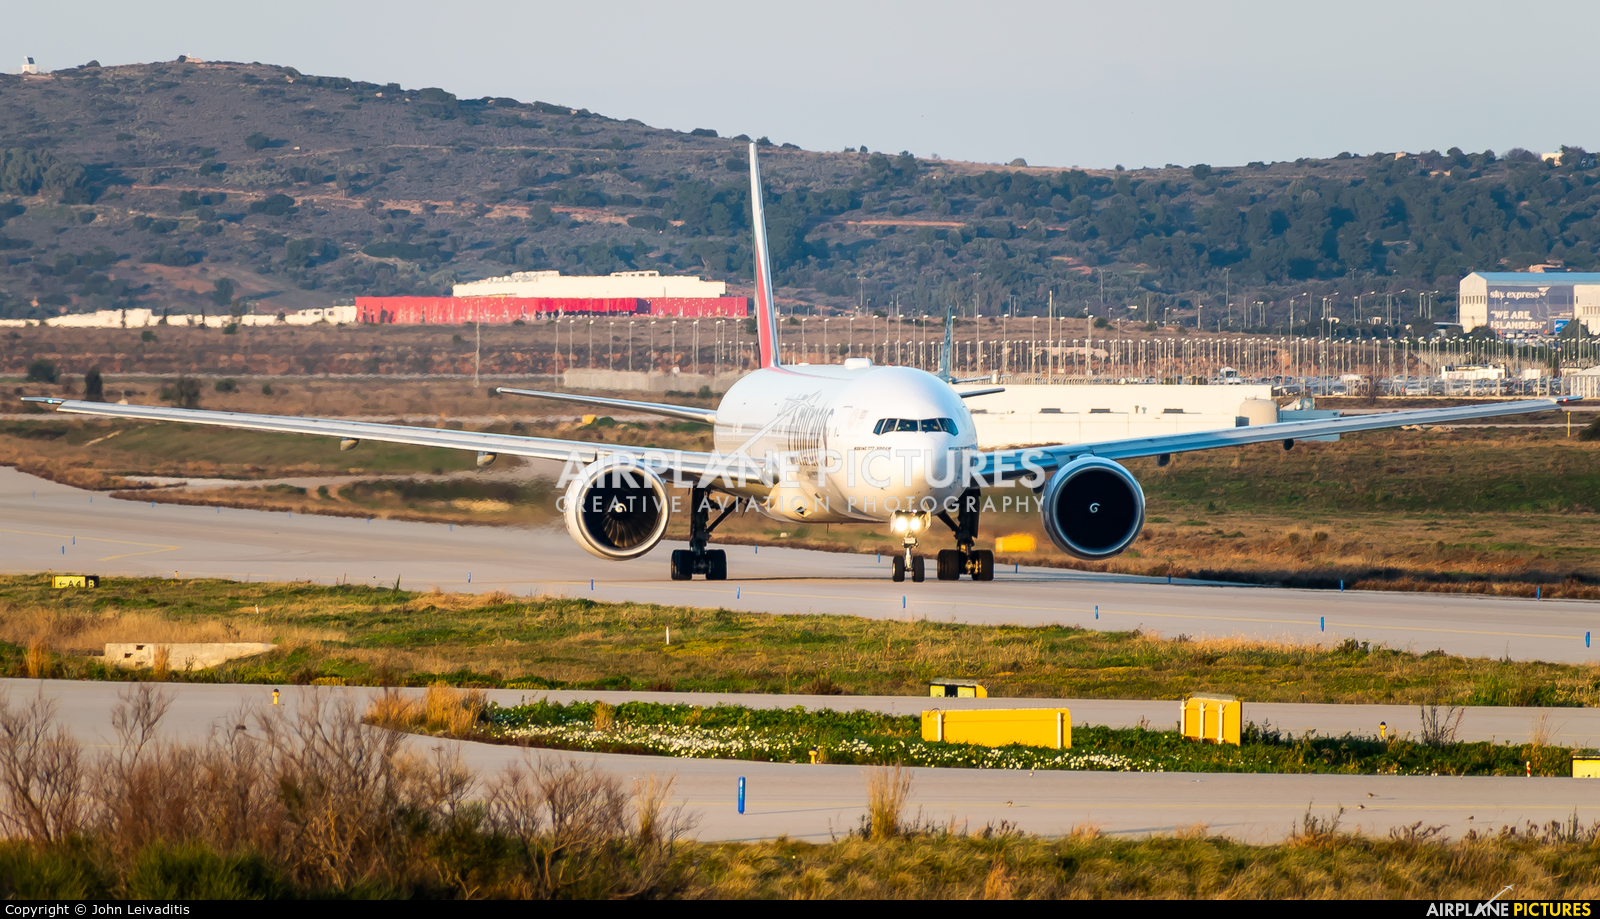 Emirates Airlines A6-ECR aircraft at Athens - Eleftherios Venizelos